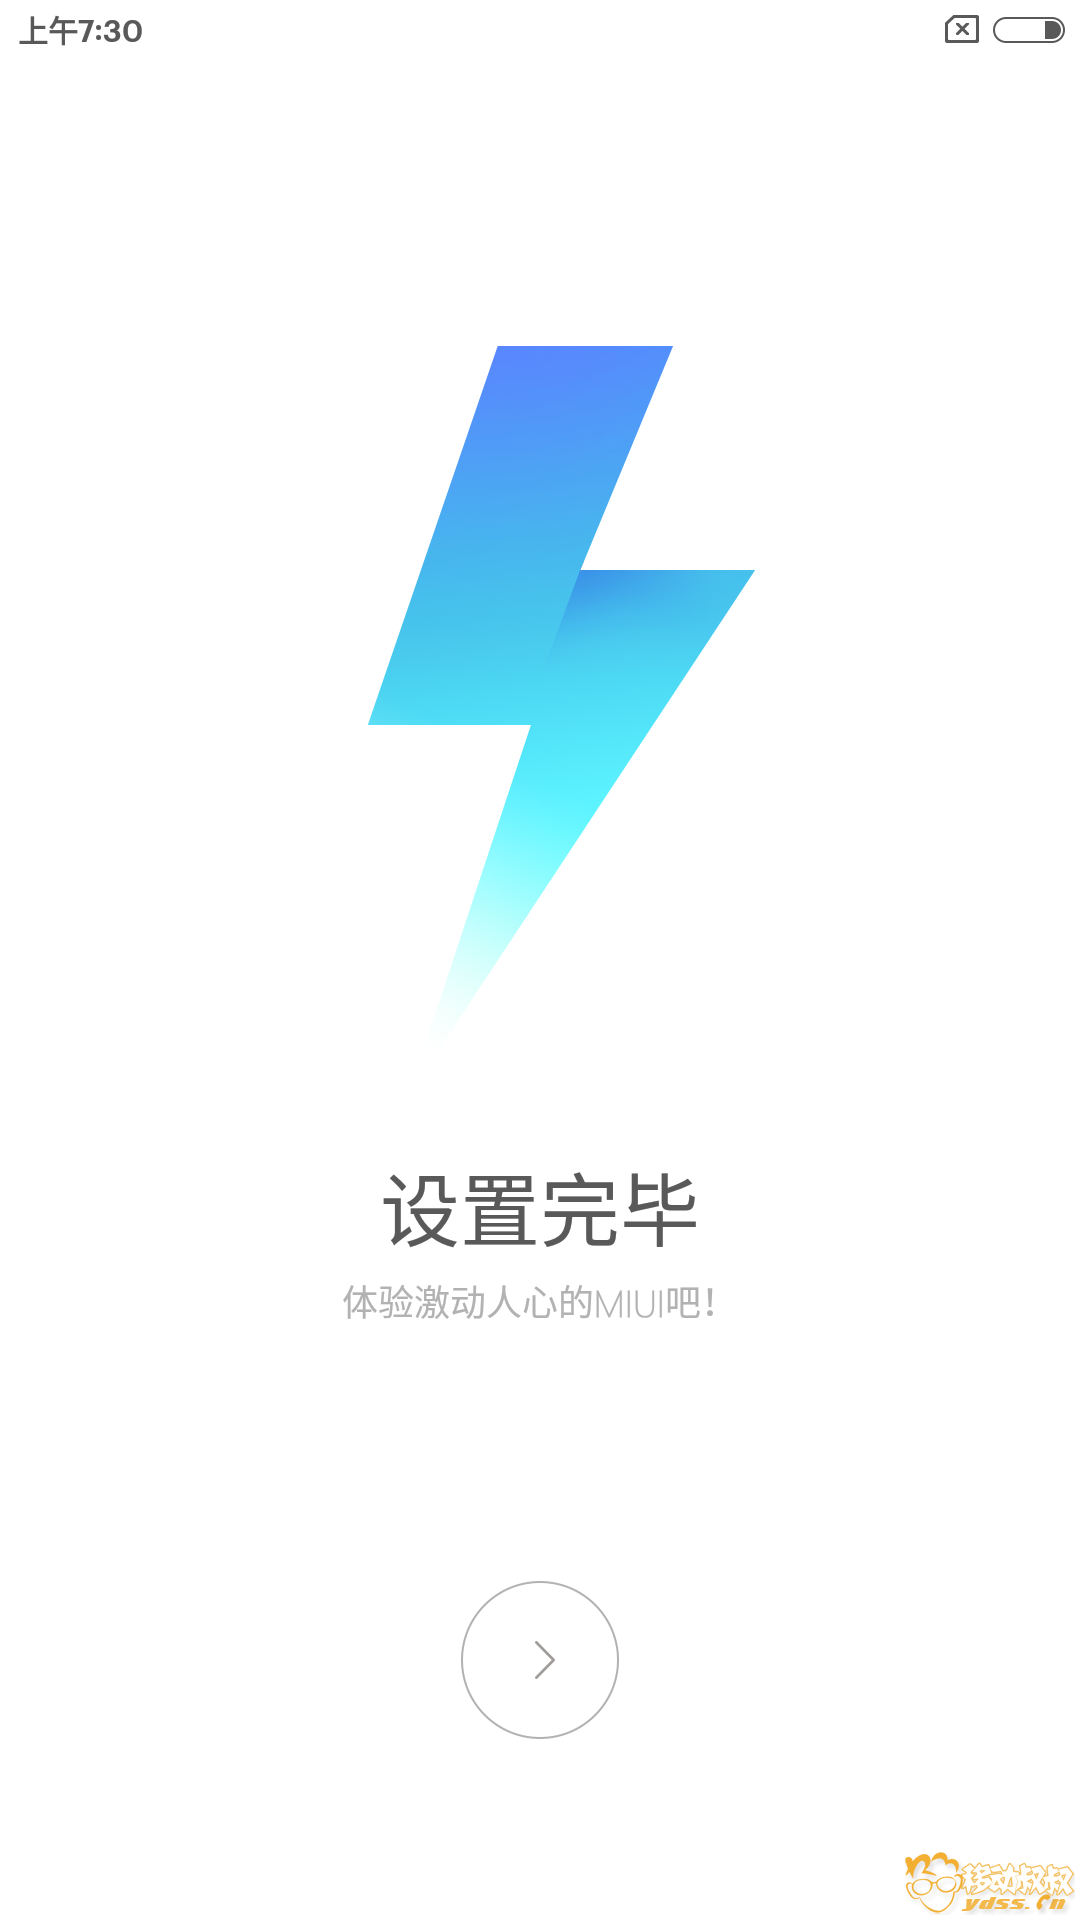 Screenshot_2018-04-21-07-30-38-241_com.android.provision.png